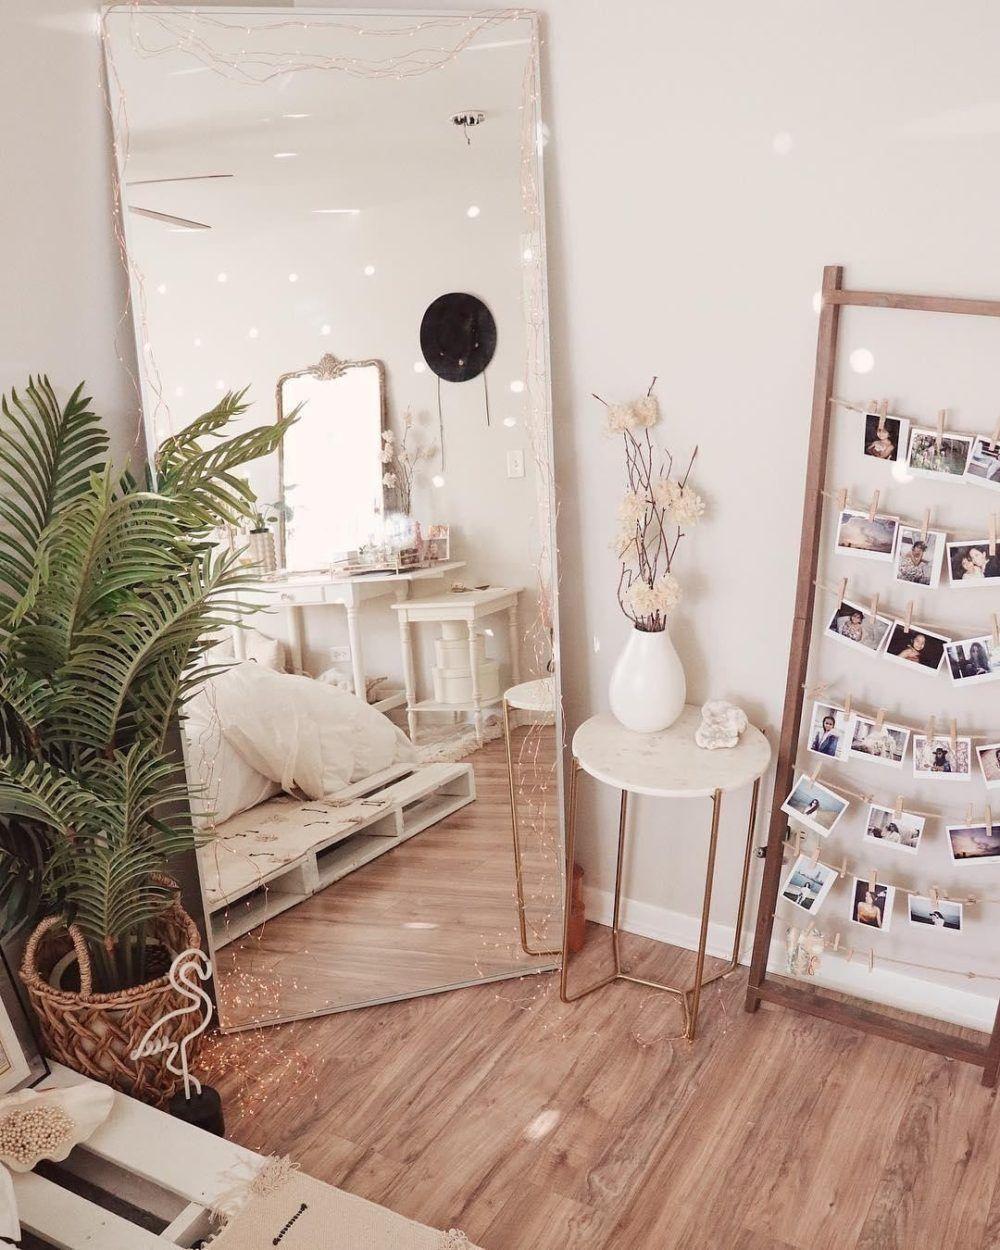 Room Decor Ideas Collegelife Pinterest Shinegirlsmvmnt In 2020 Dorm Room Decor Room Decor Bedroom Bedroom Makeover